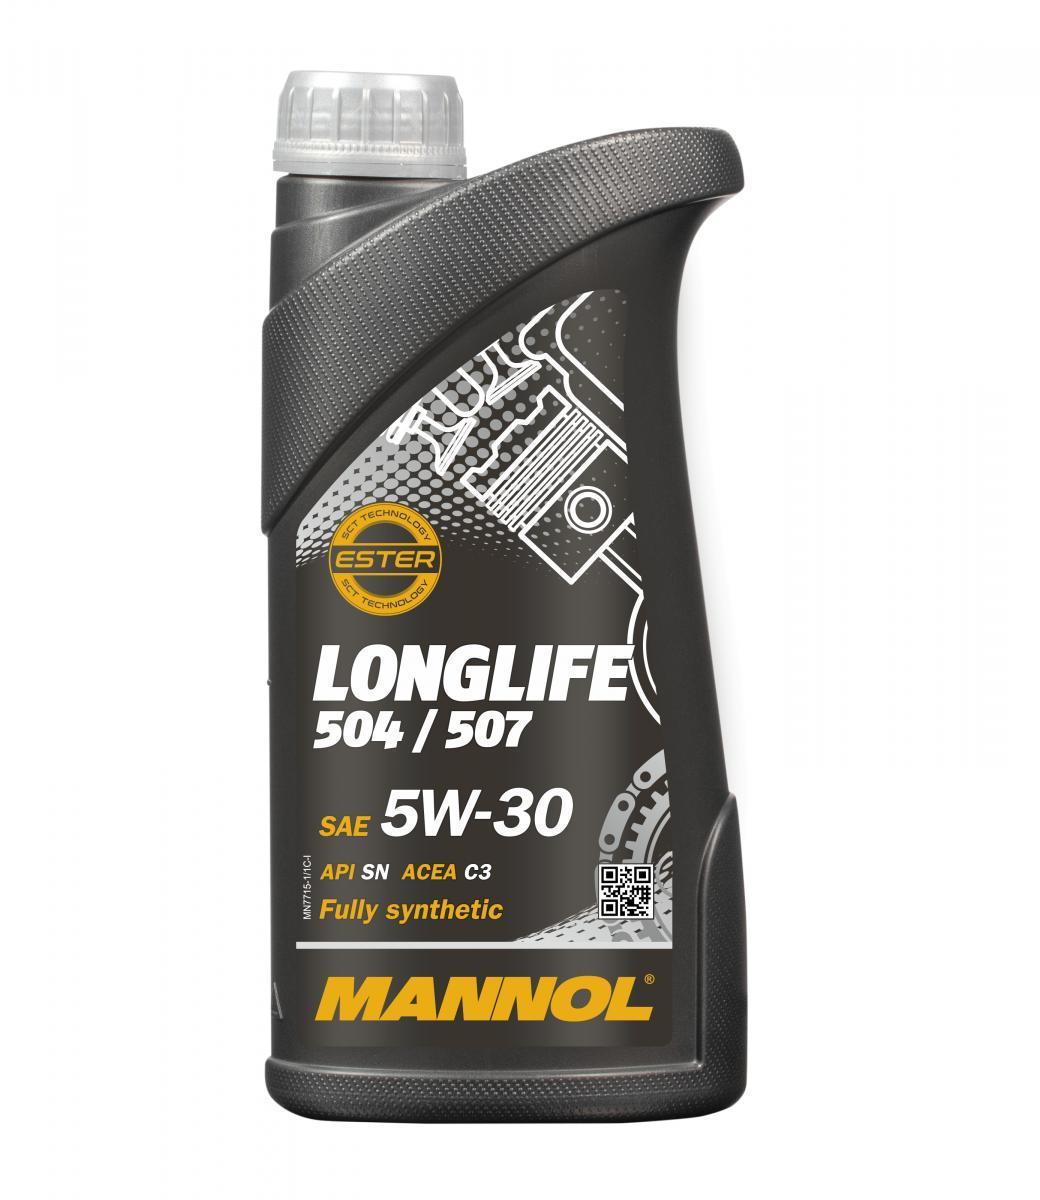 Car oil MN7715-1